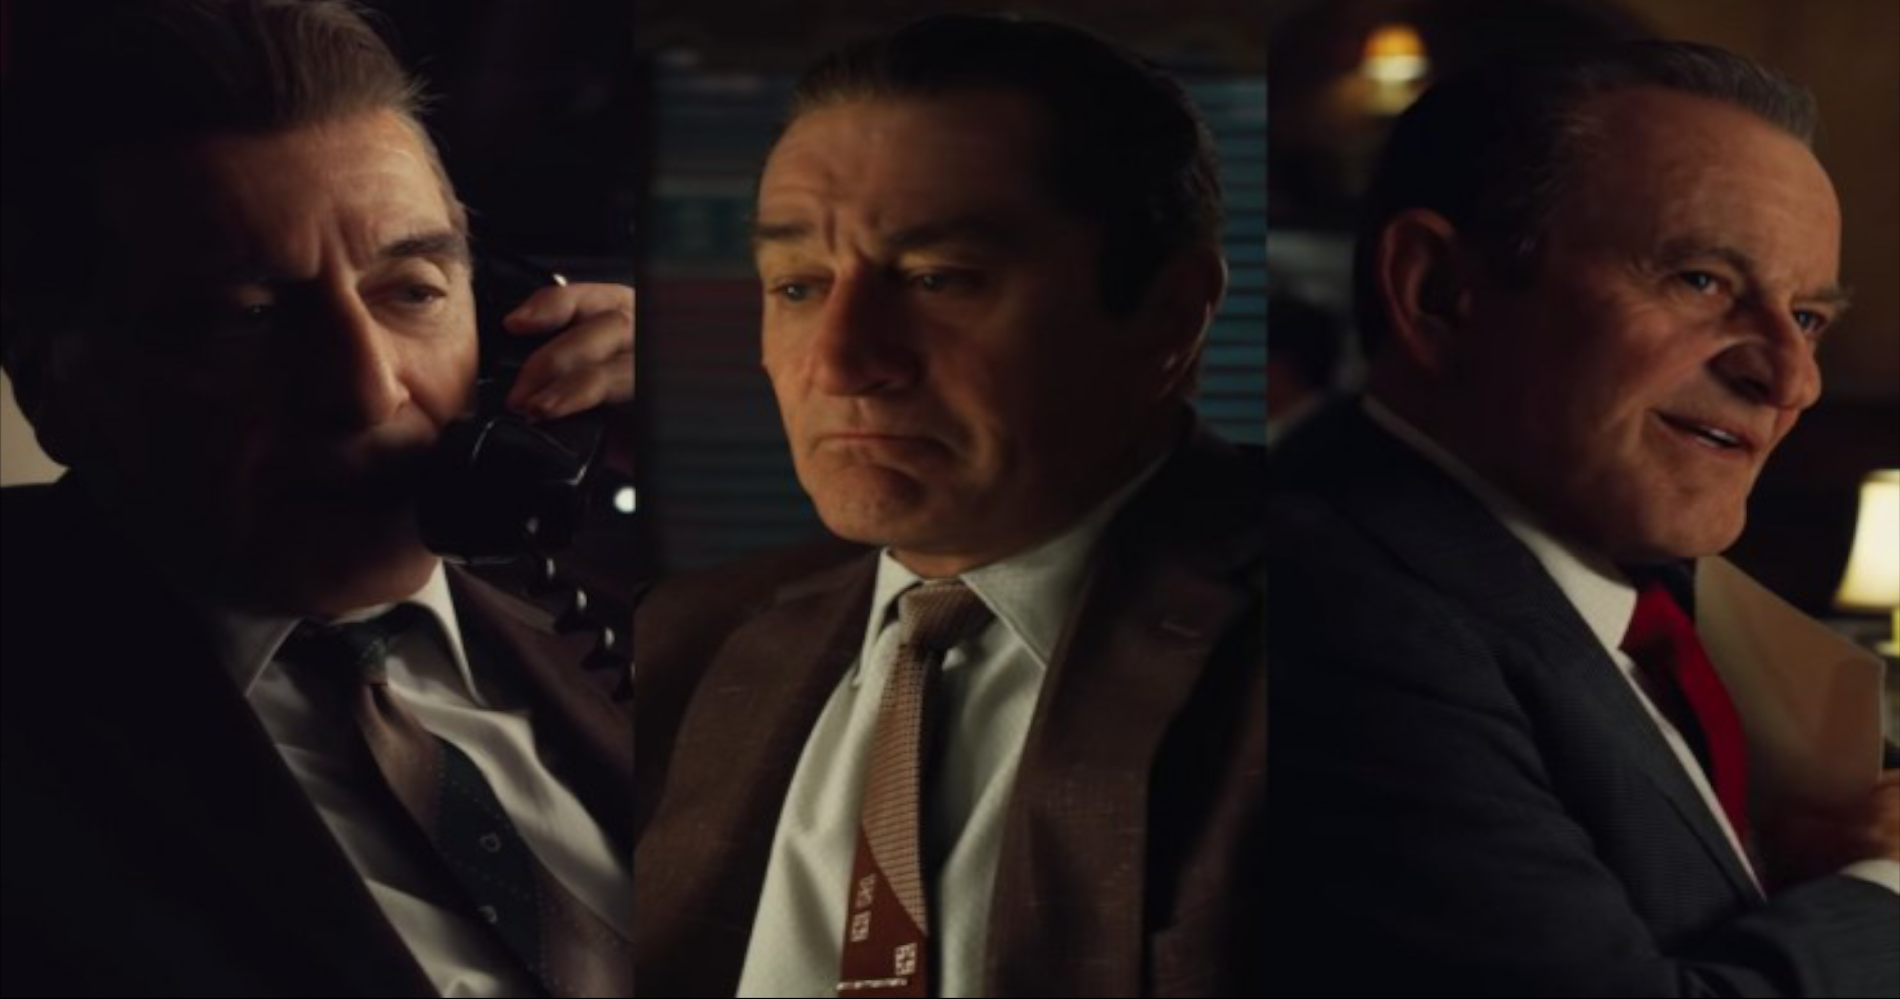 "<span class=""entry-title-primary"">The Irishman: metafora di un cinema in declino</span> <span class=""entry-subtitle"">Scorsese colpisce ancora.</span>"